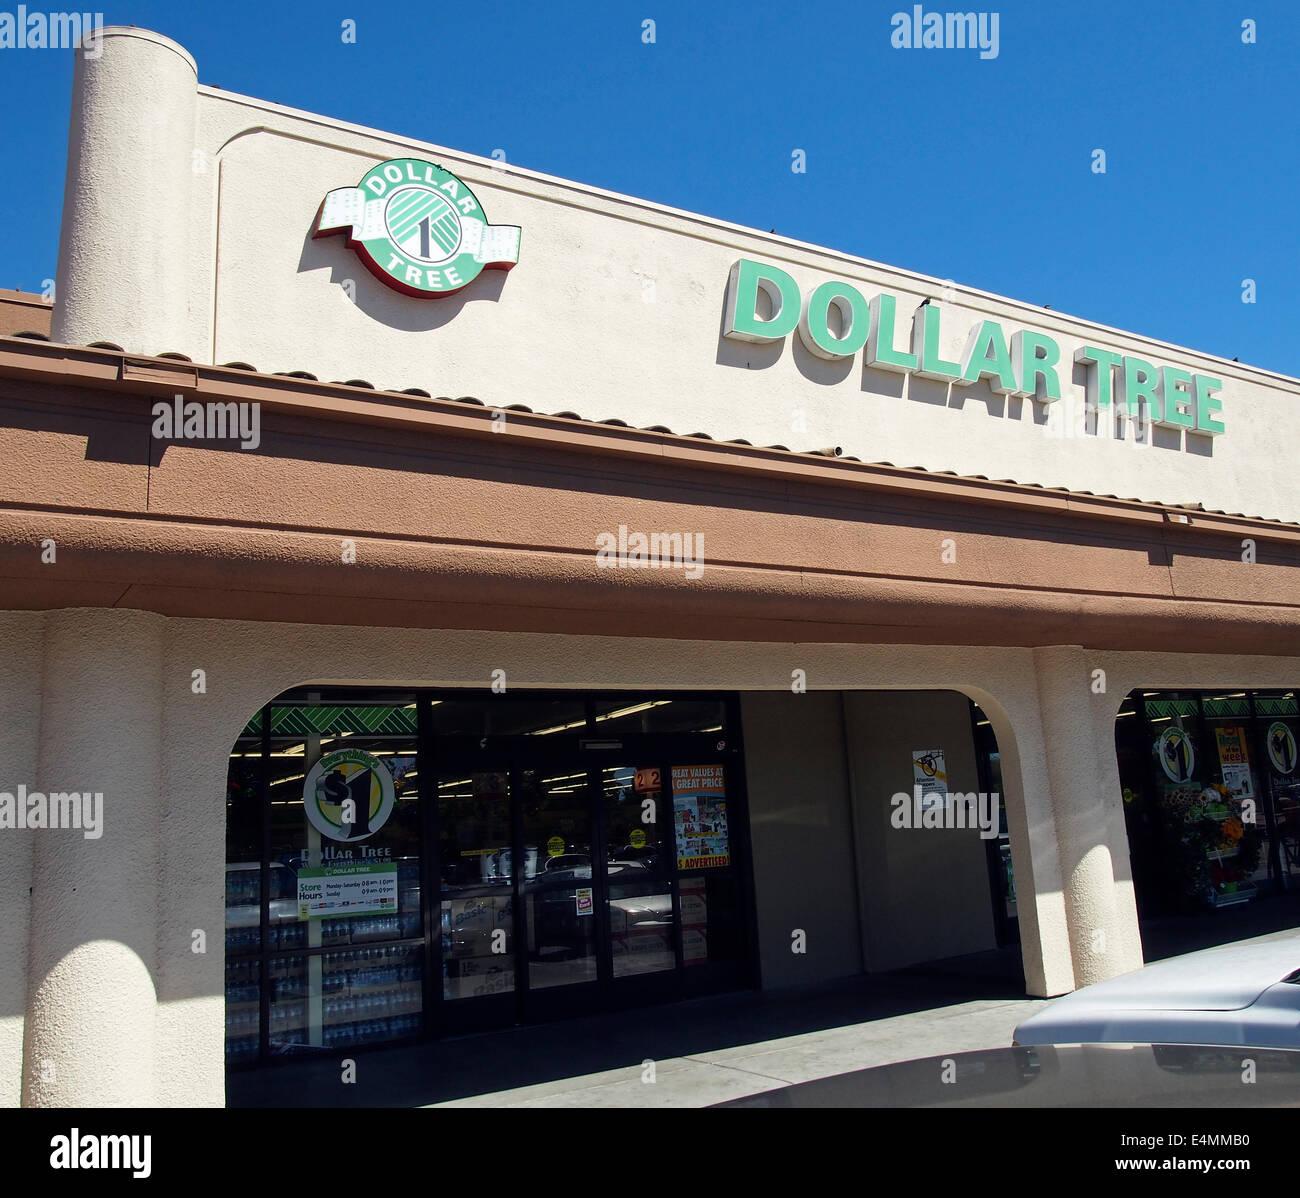 Dollar Tree Store: Dollar Tree Store Stock Photos & Dollar Tree Store Stock